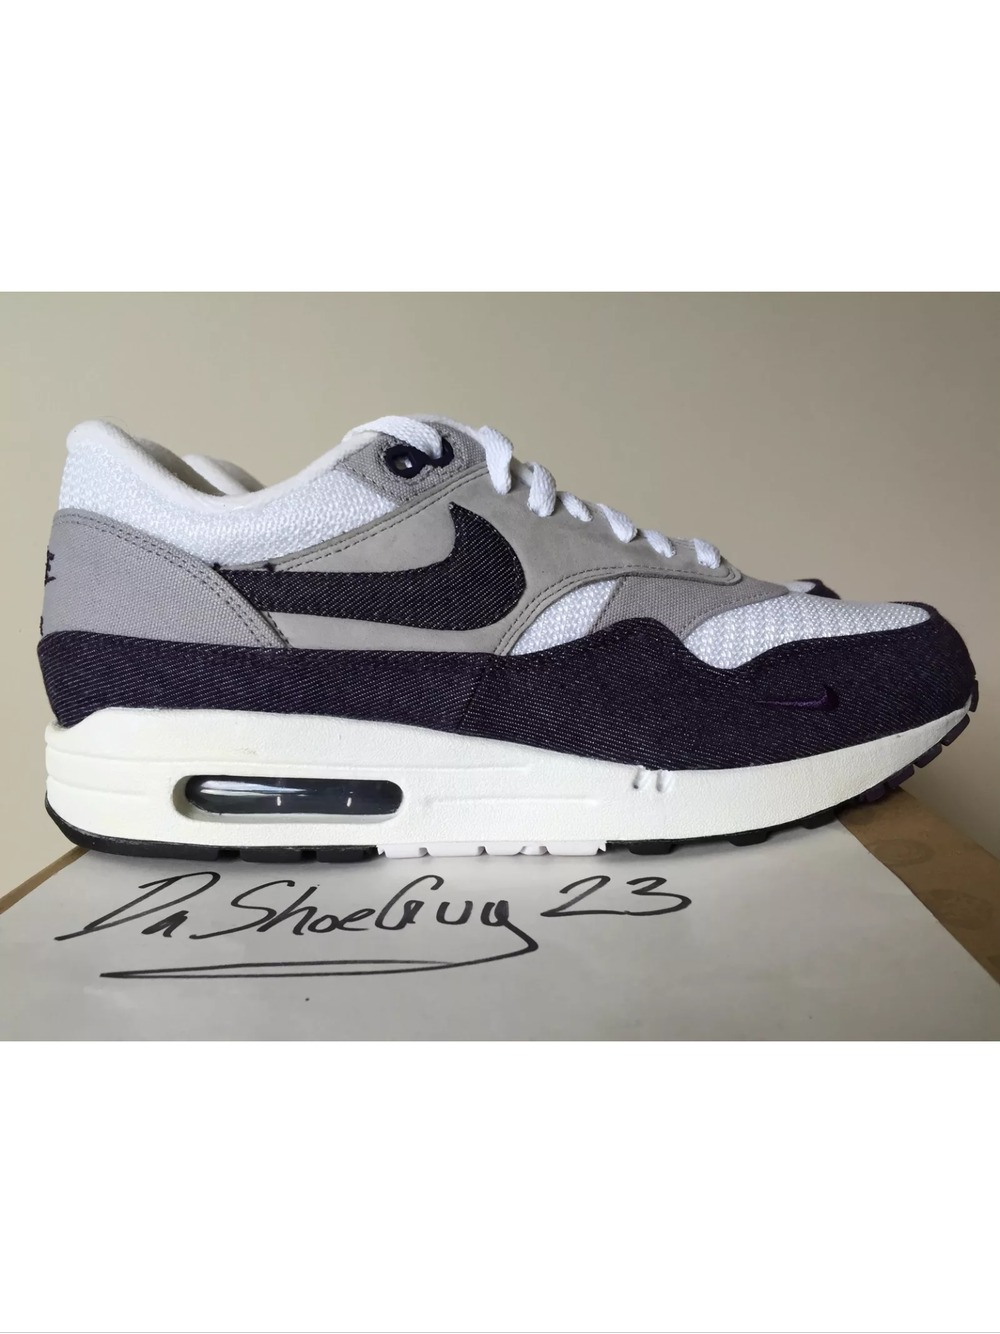 uk availability ea79b 07537 DS Nike Air Max 1 PATTA PURPLE DENIM US 9 UK 8 - photo 1  ...